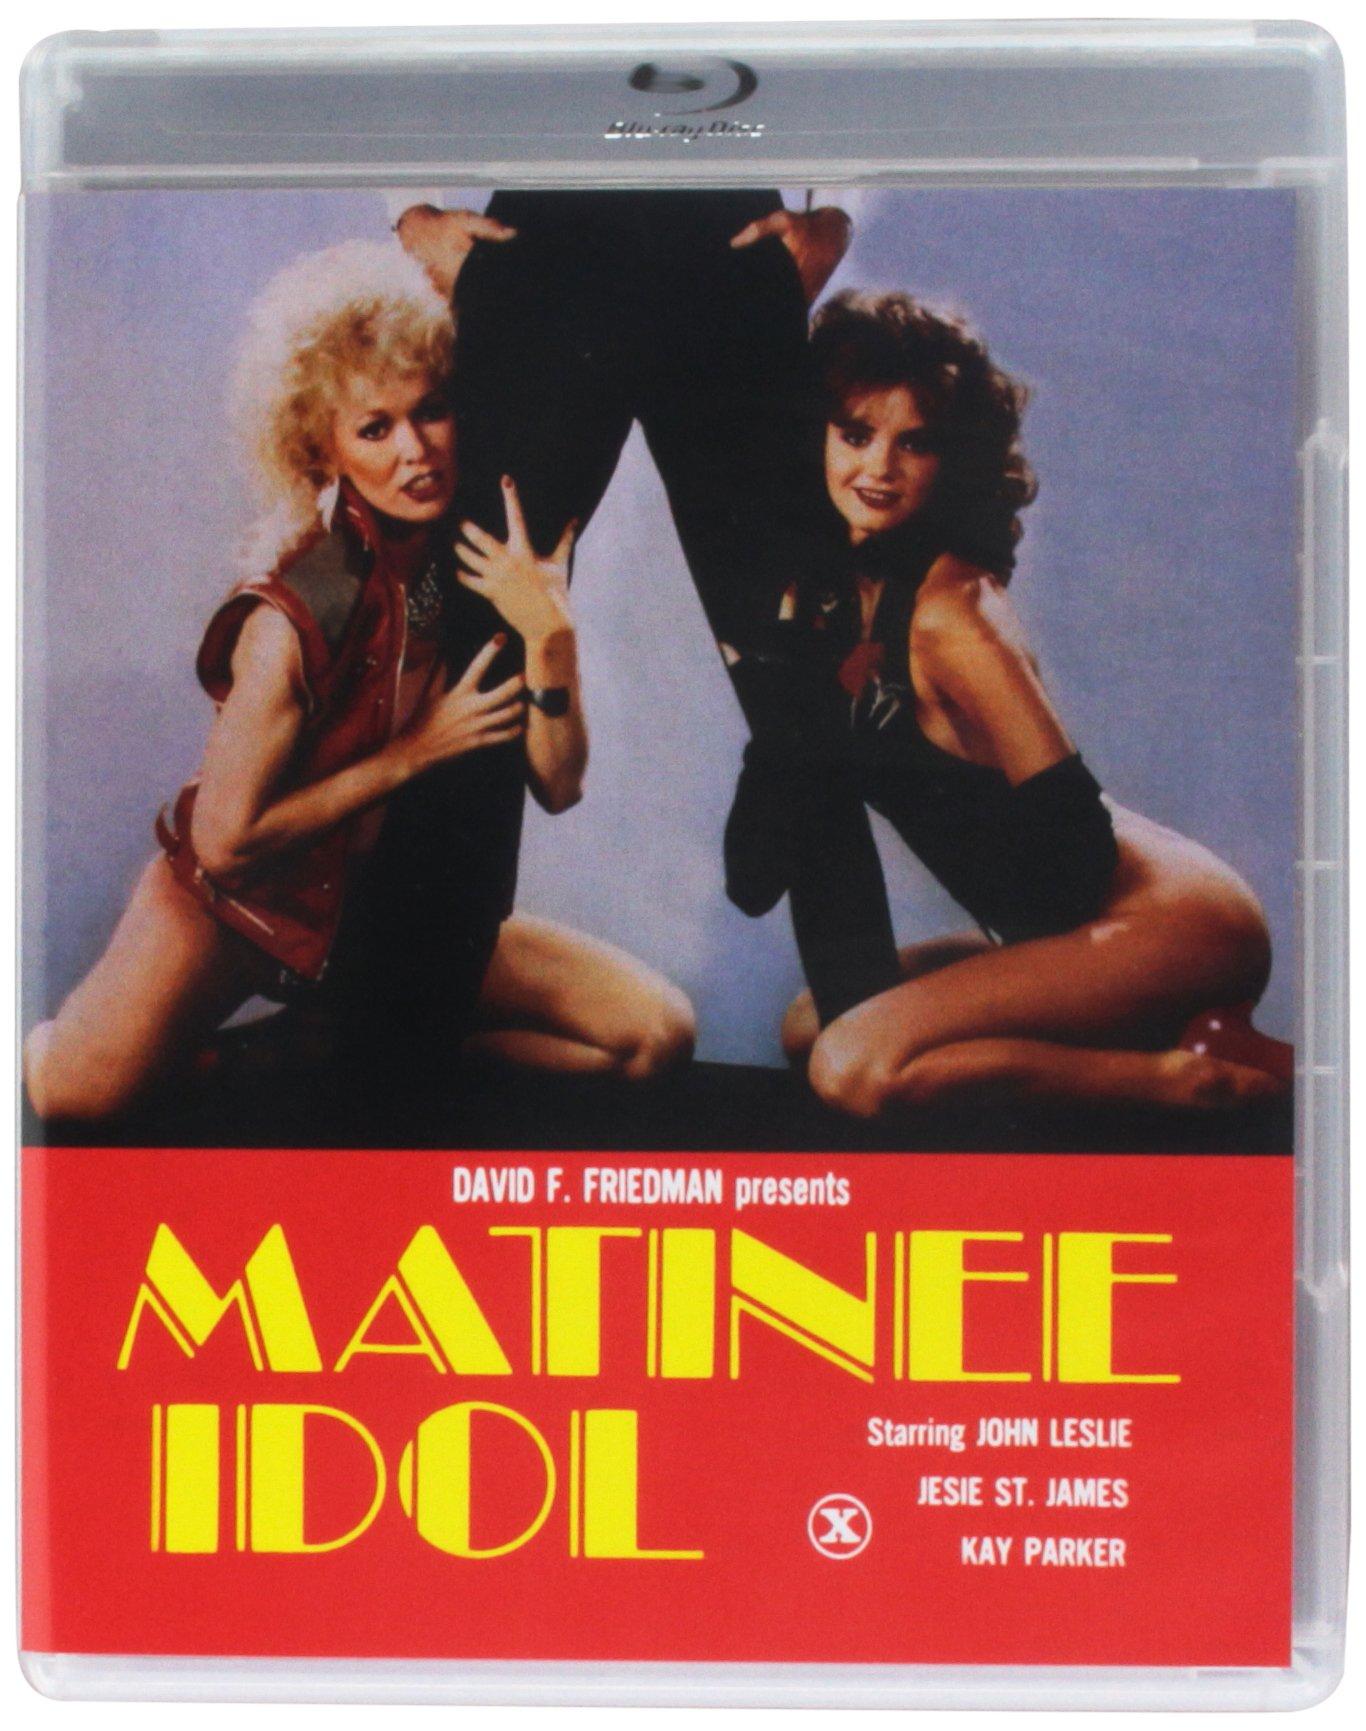 Blu-ray : Matinee Idol (With DVD)